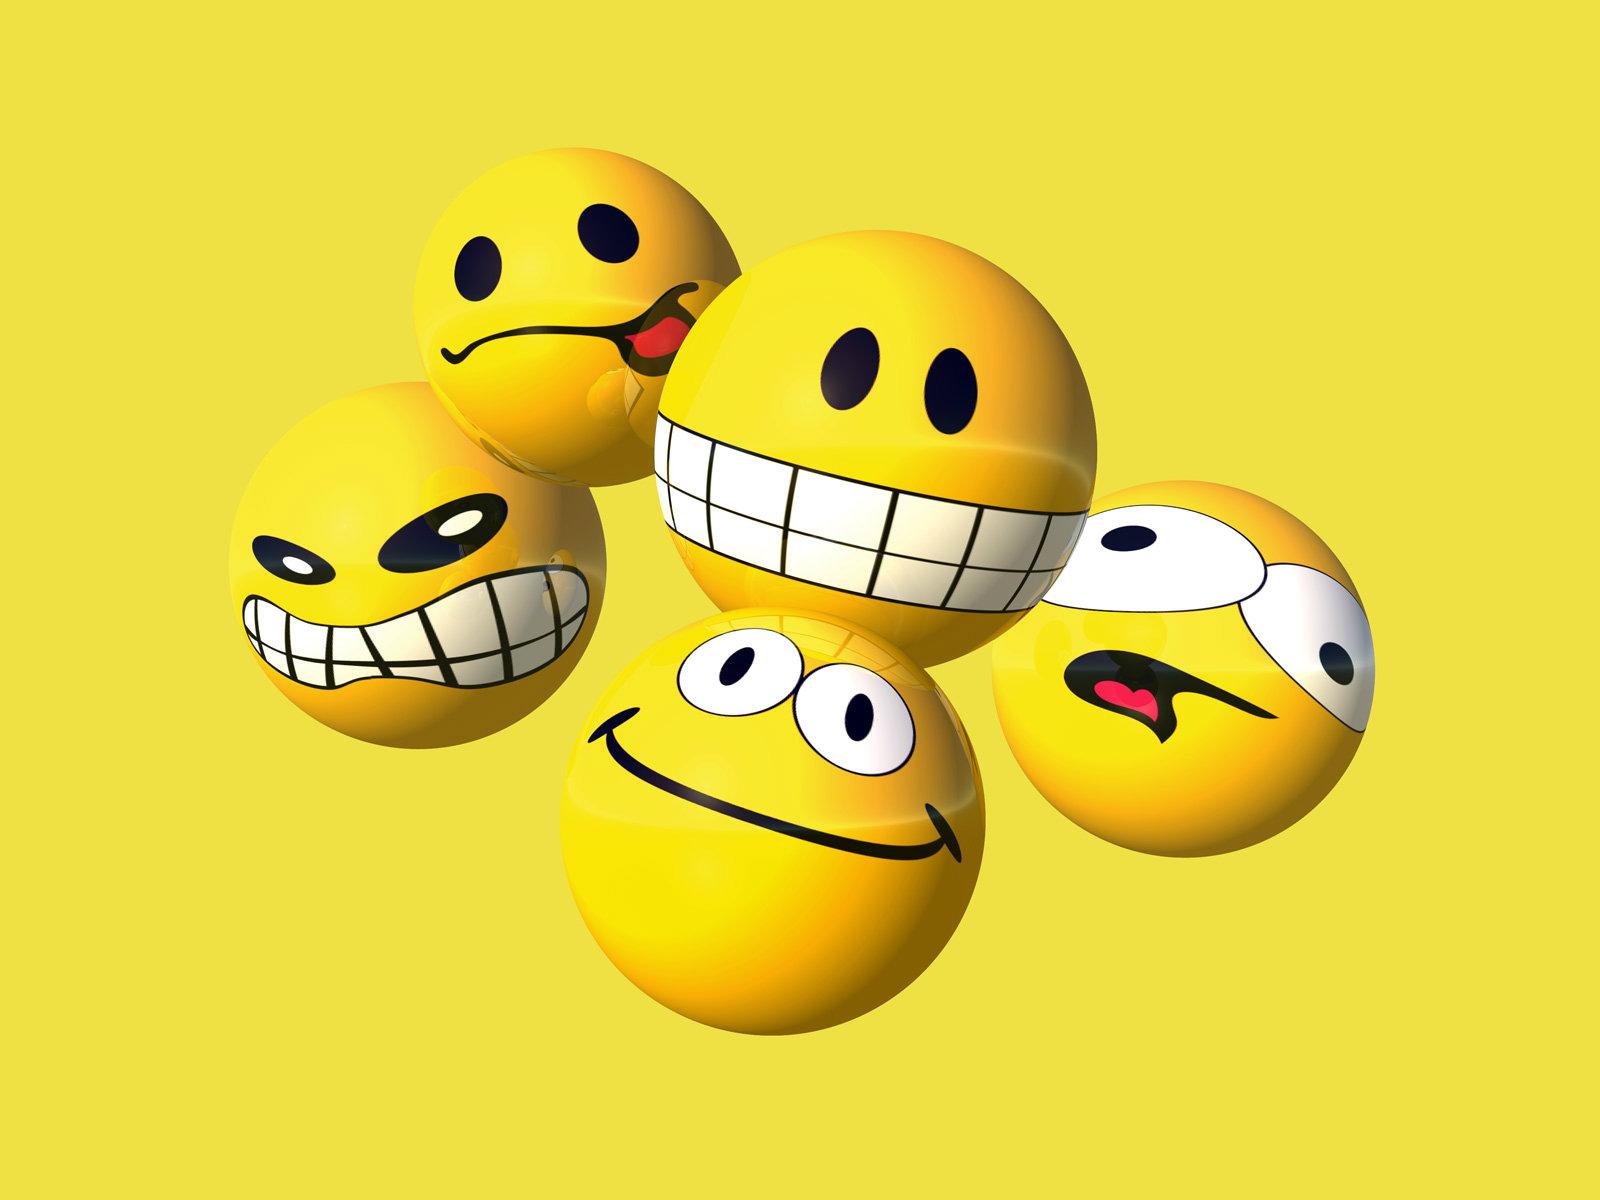 Beautiful Smileys Emoticons Wallpapers For Desktop HD 1600x1200